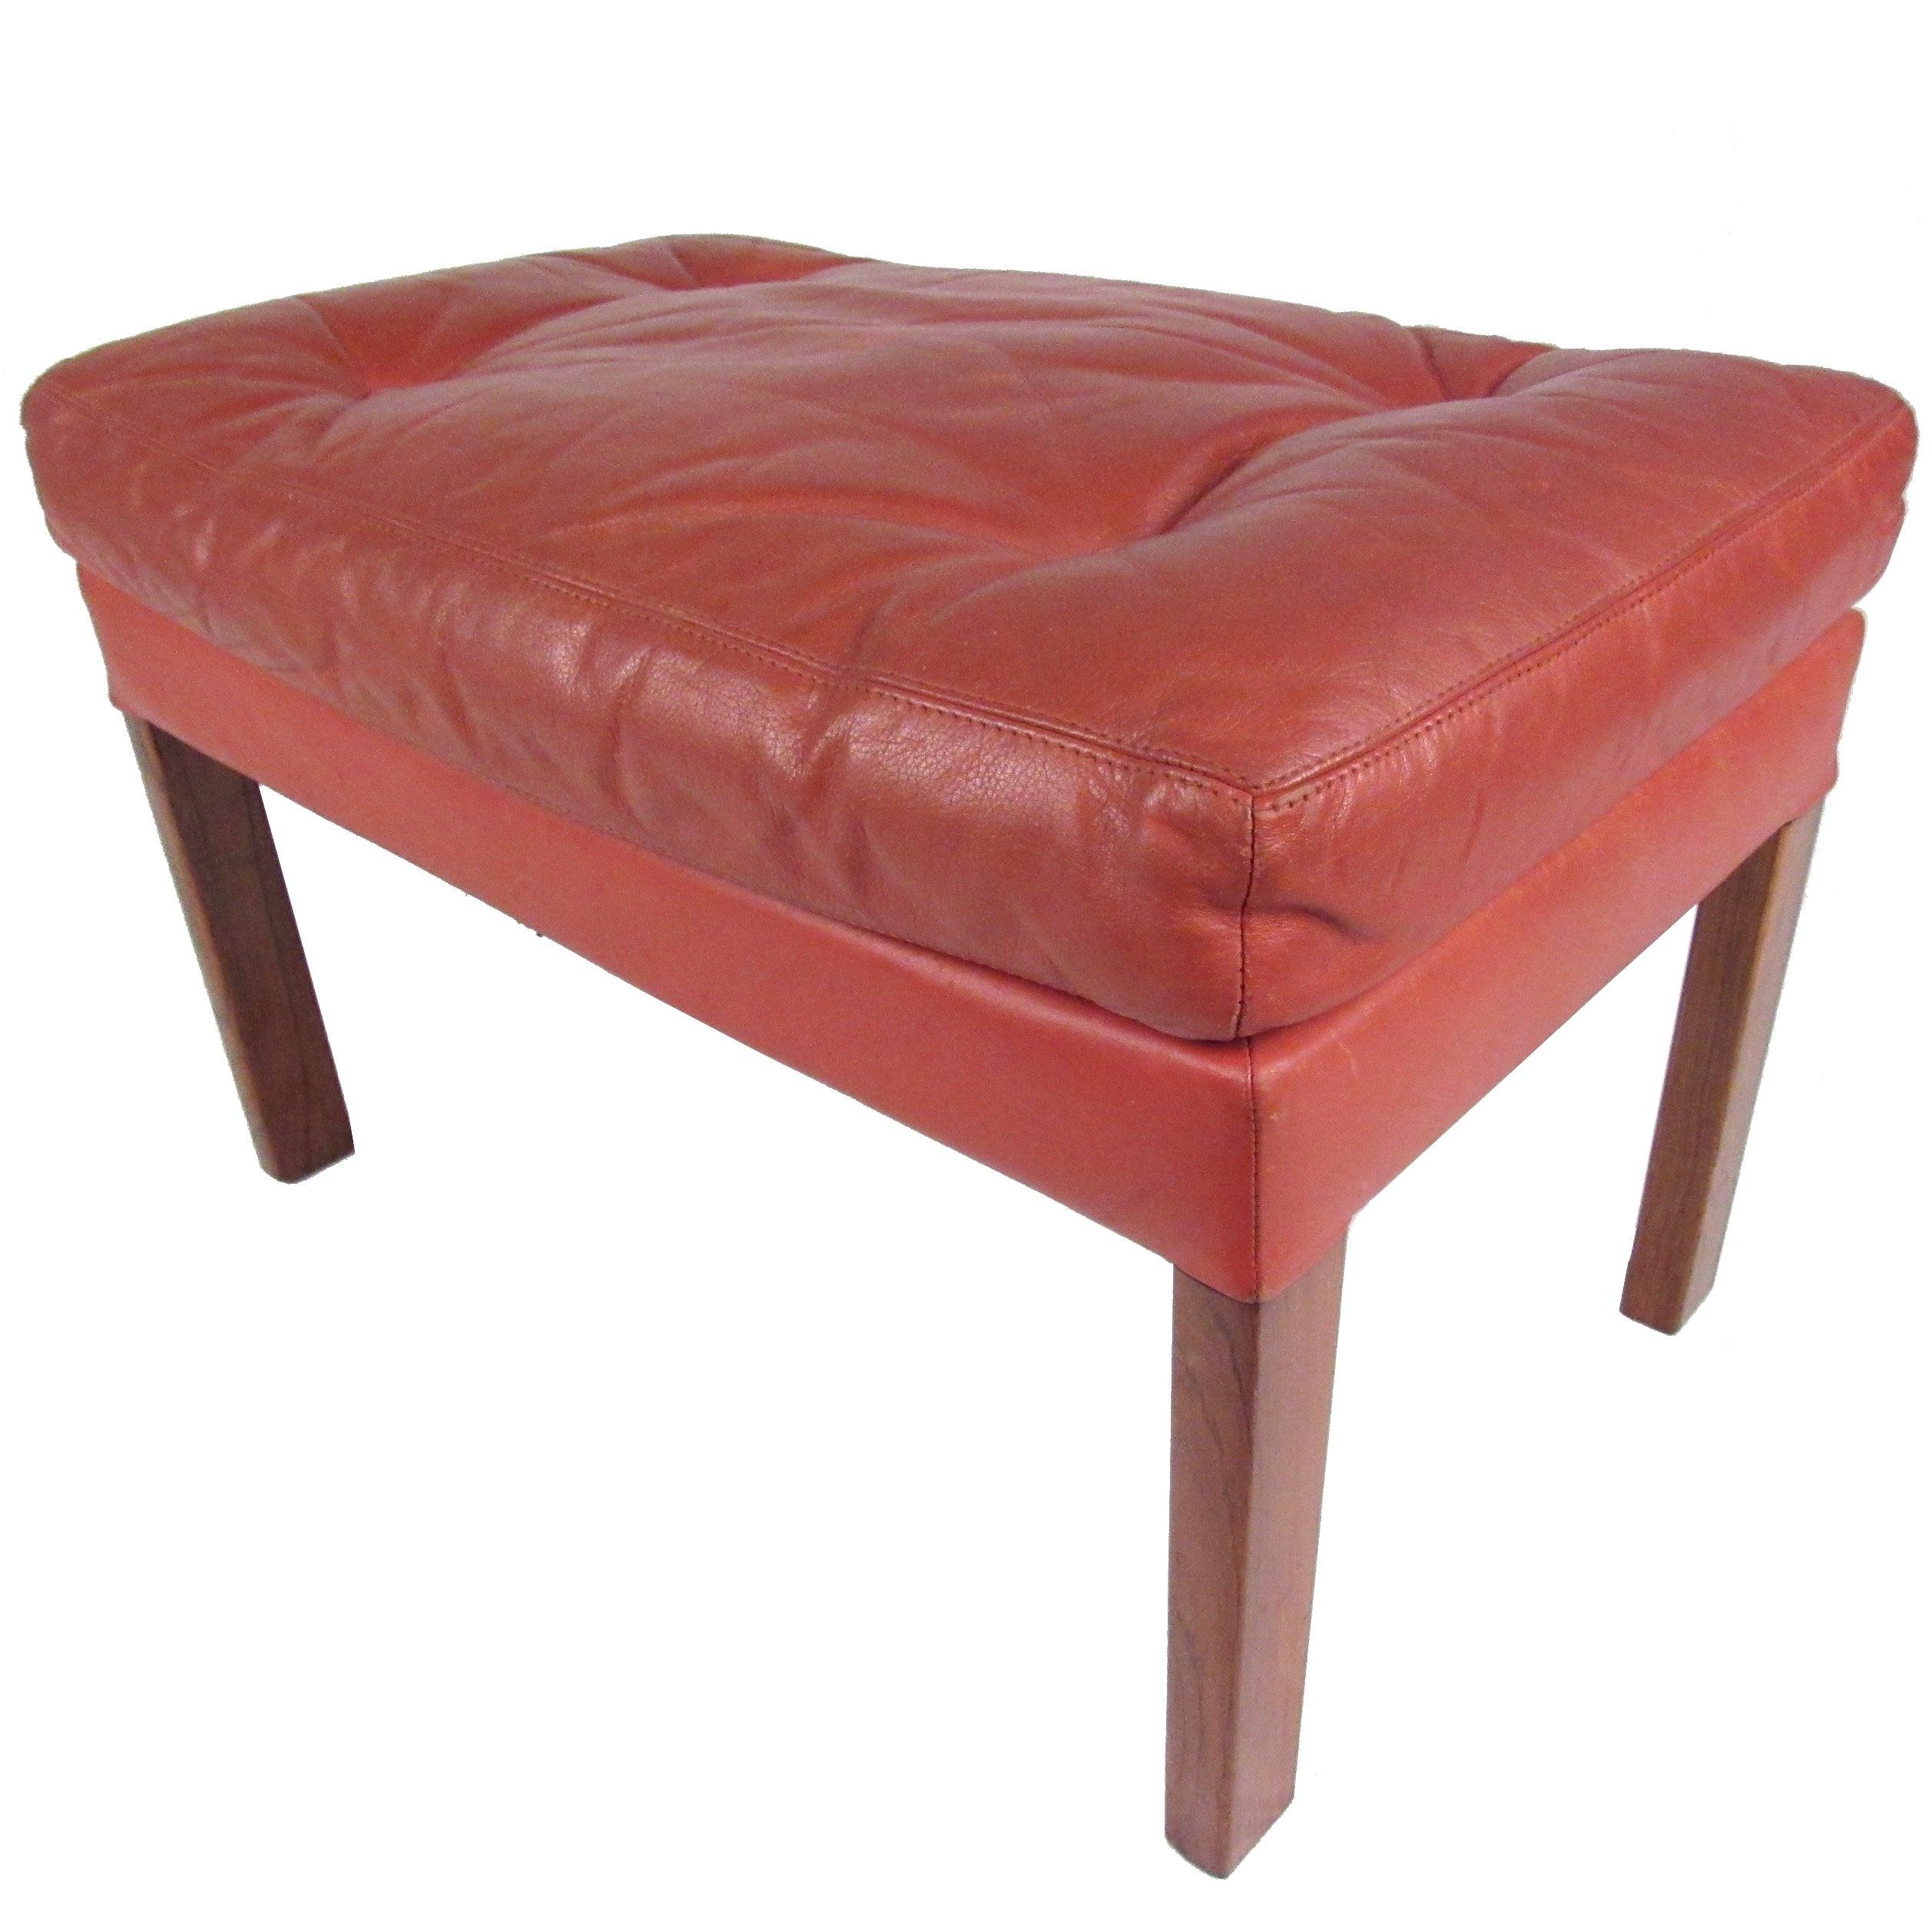 Danish Modern Tufted Leather Ottoman